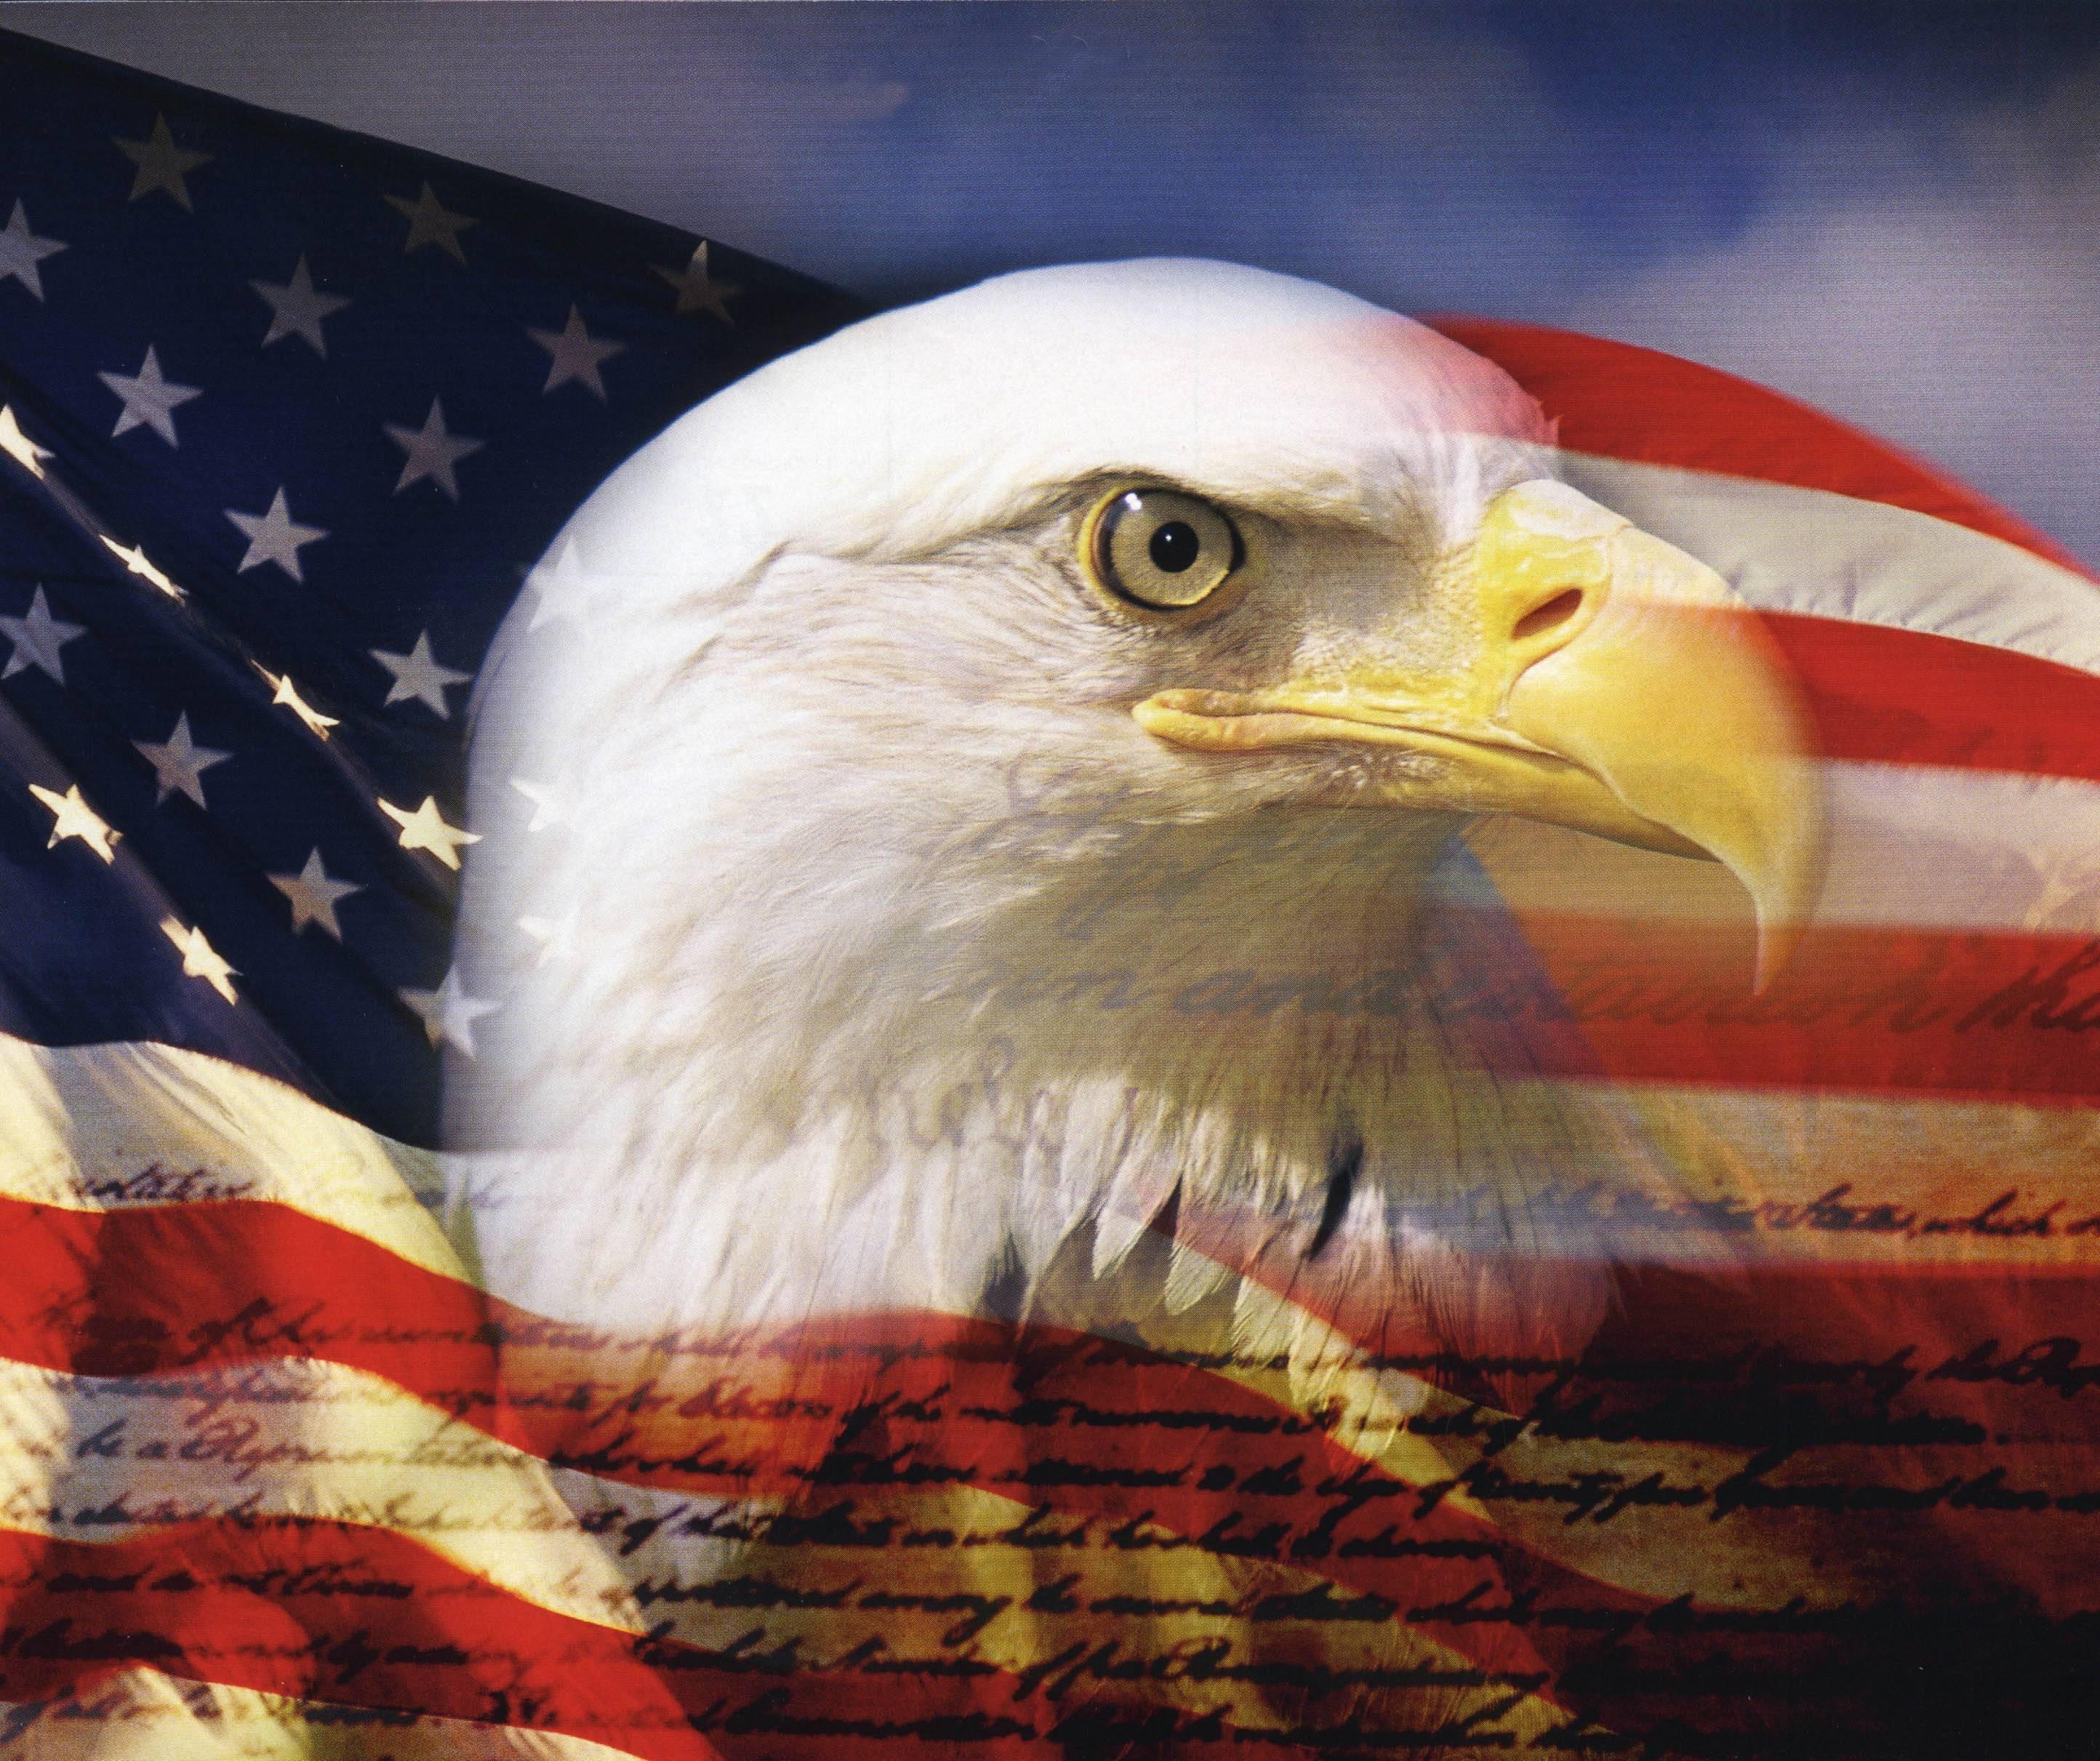 american eagle wallpaper hd > yodobi